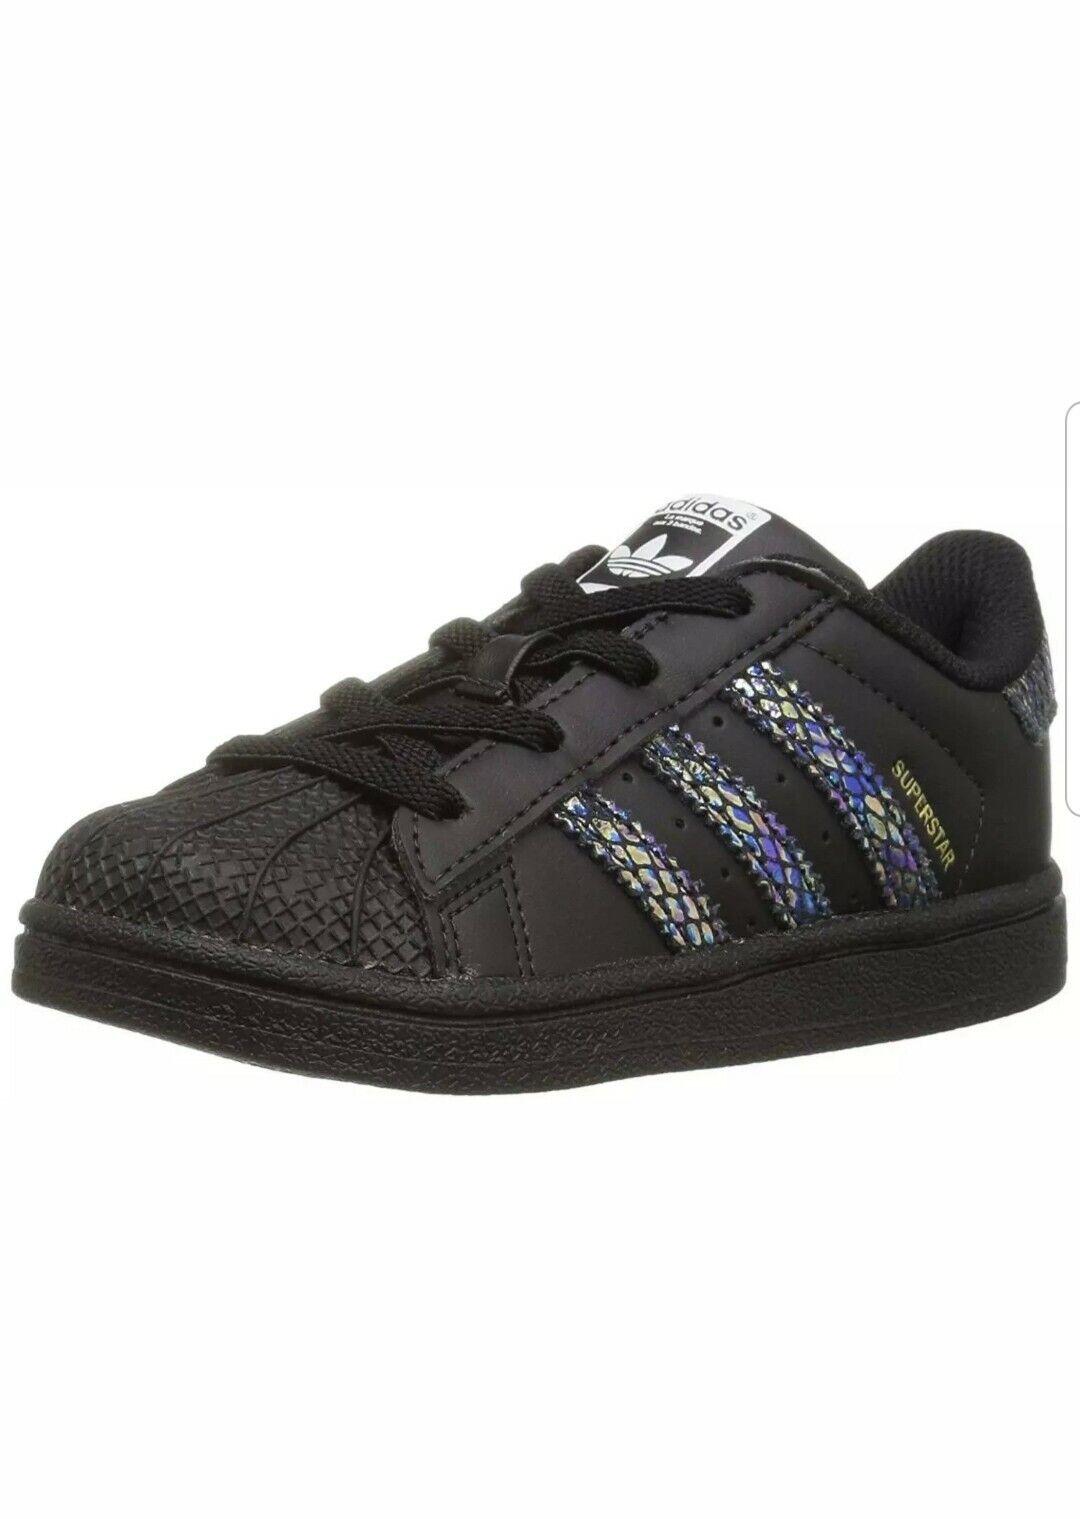 adidas Originals Baby Superstar EL I Black Rainbow Snake Size 4 M US Toddler 1